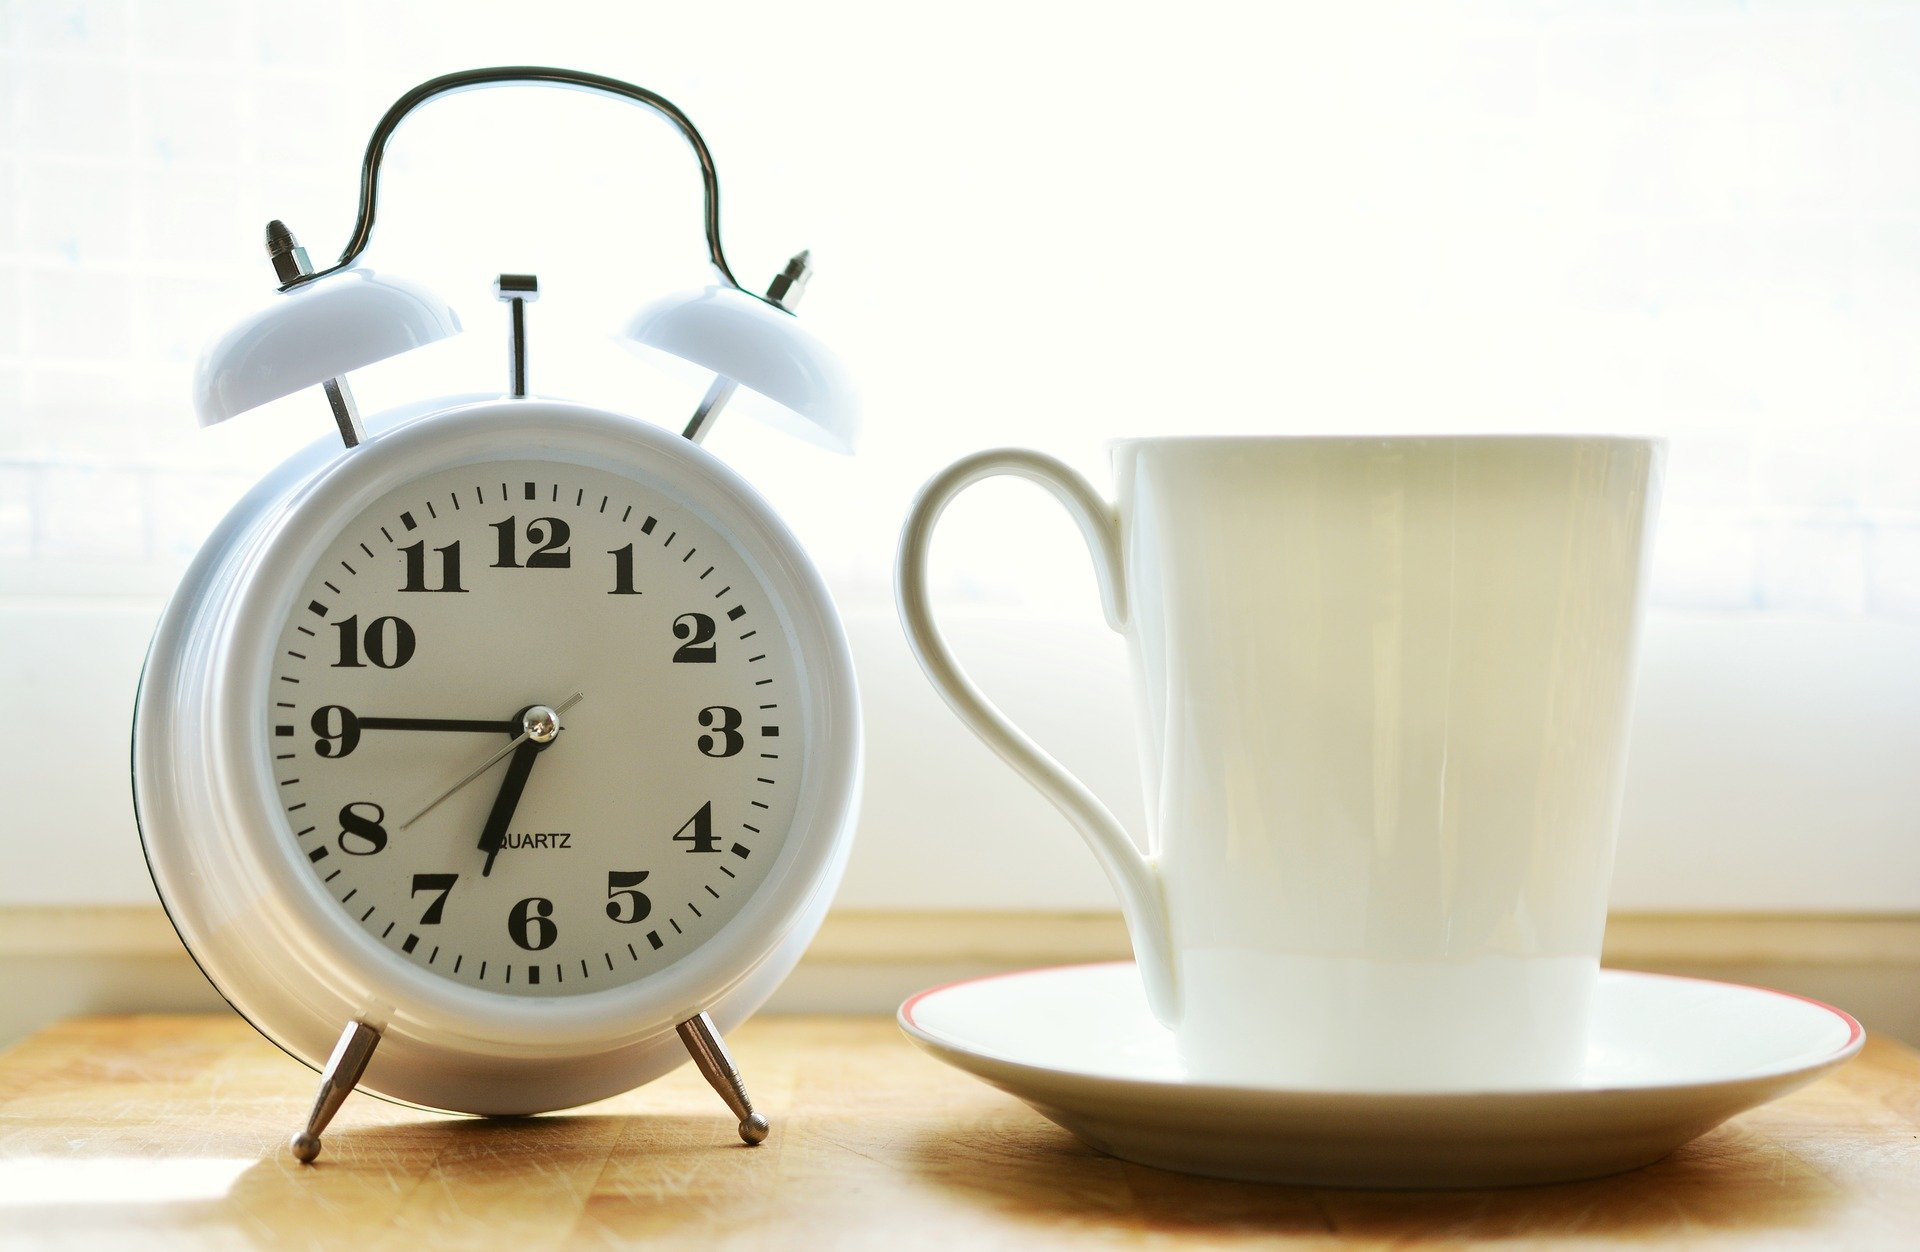 Bien dormir : de combien d'heures de sommeil a-t-on vraiment besoin ?